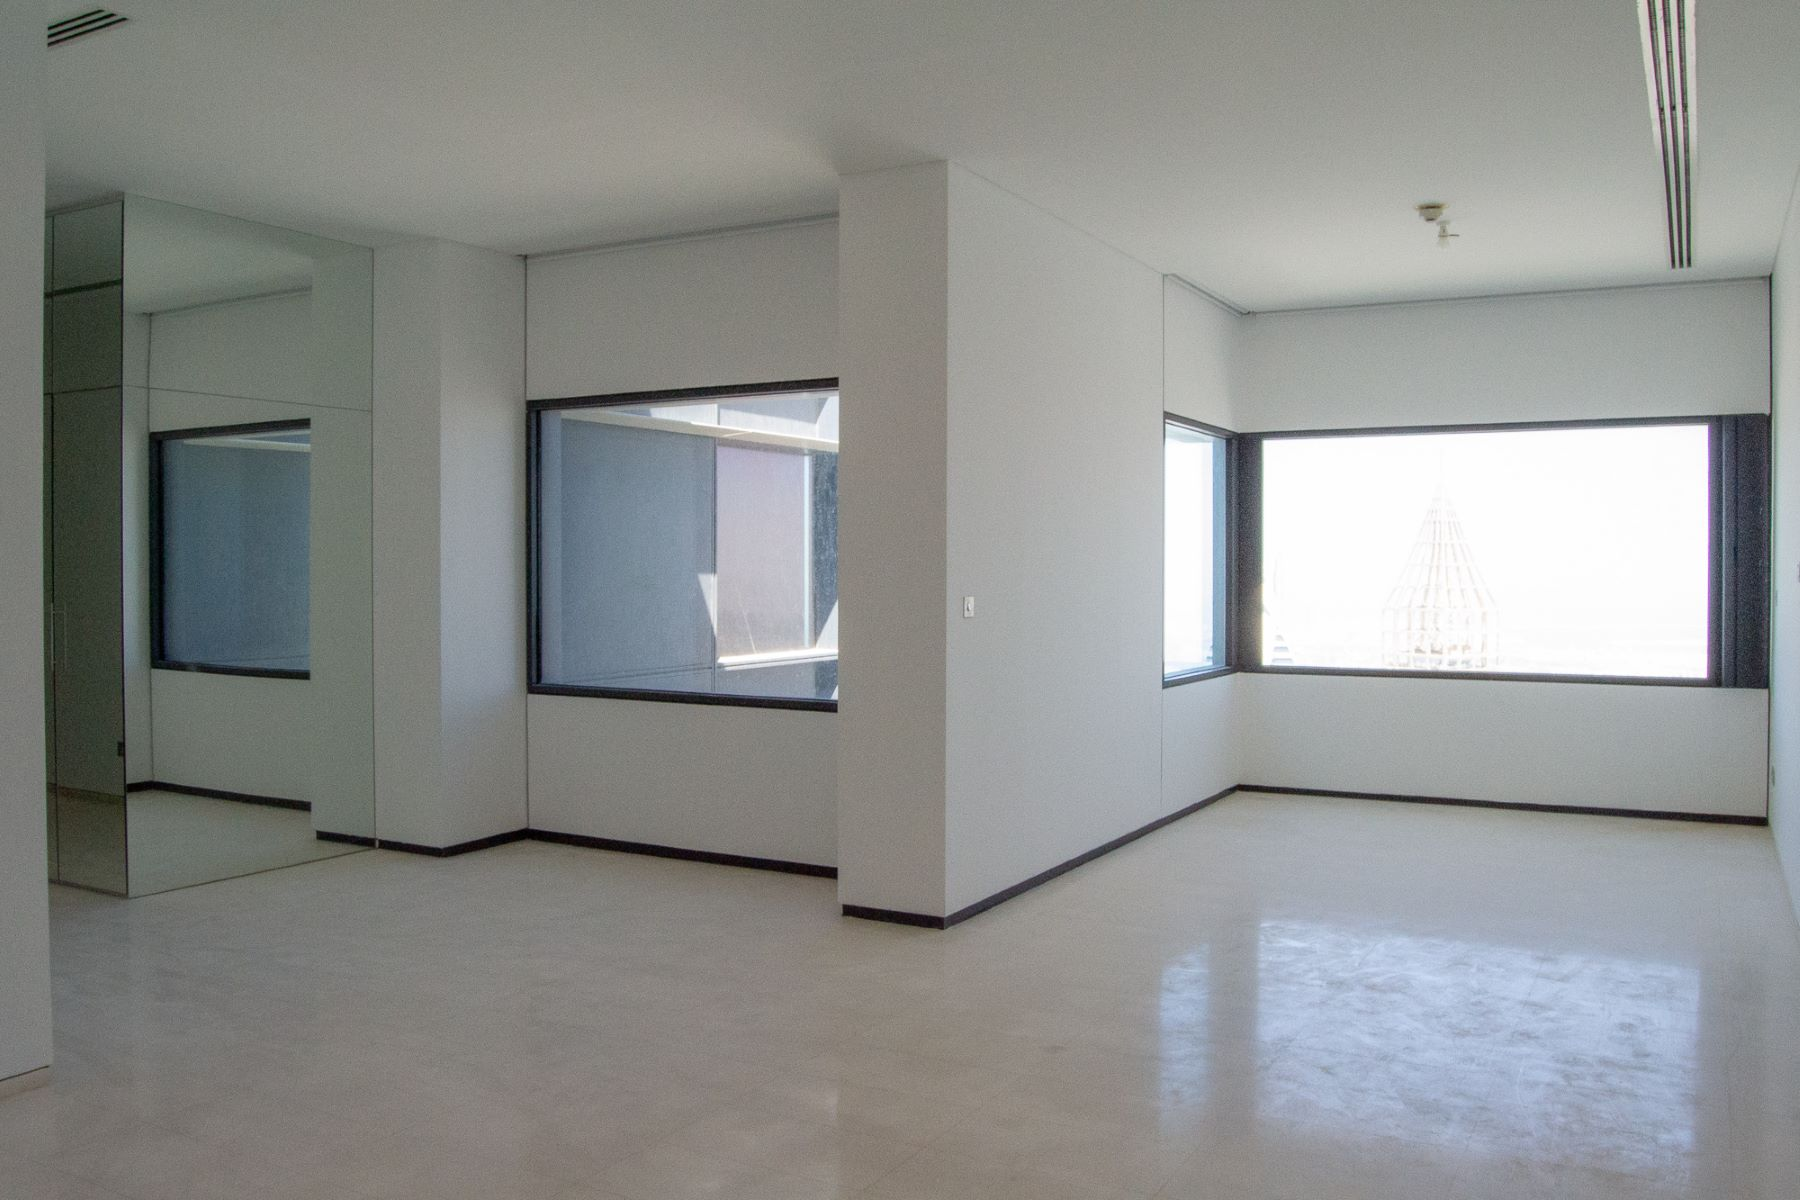 Apartments for Sale at High-rise Prestigious 5 bed triplex apt DIFC. Dubai, Dubai United Arab Emirates